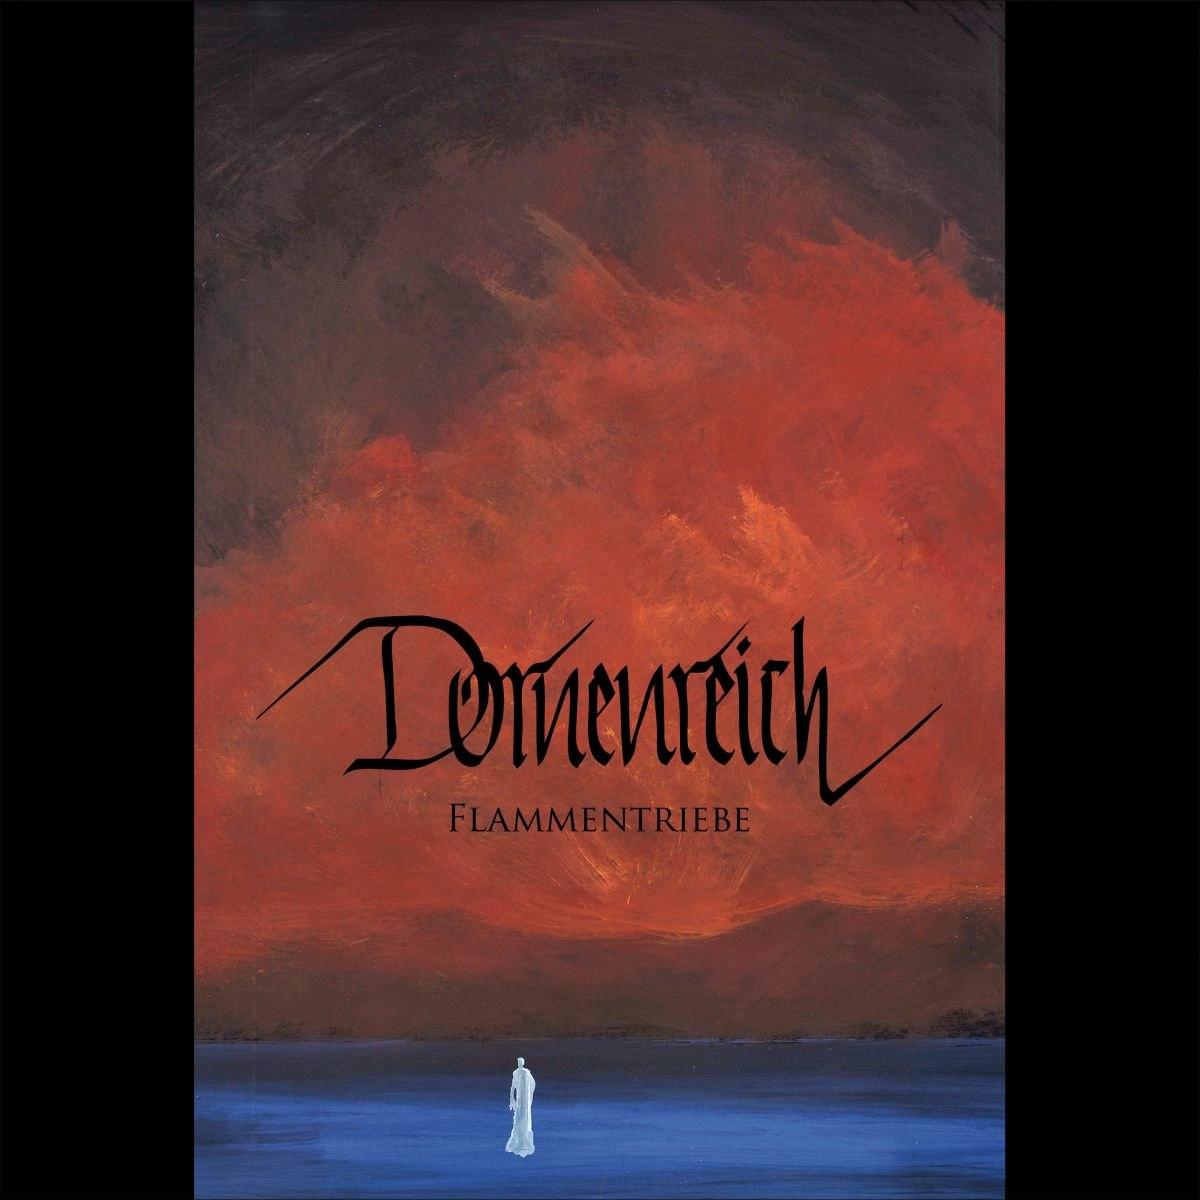 Review for Dornenreich - Flammentriebe